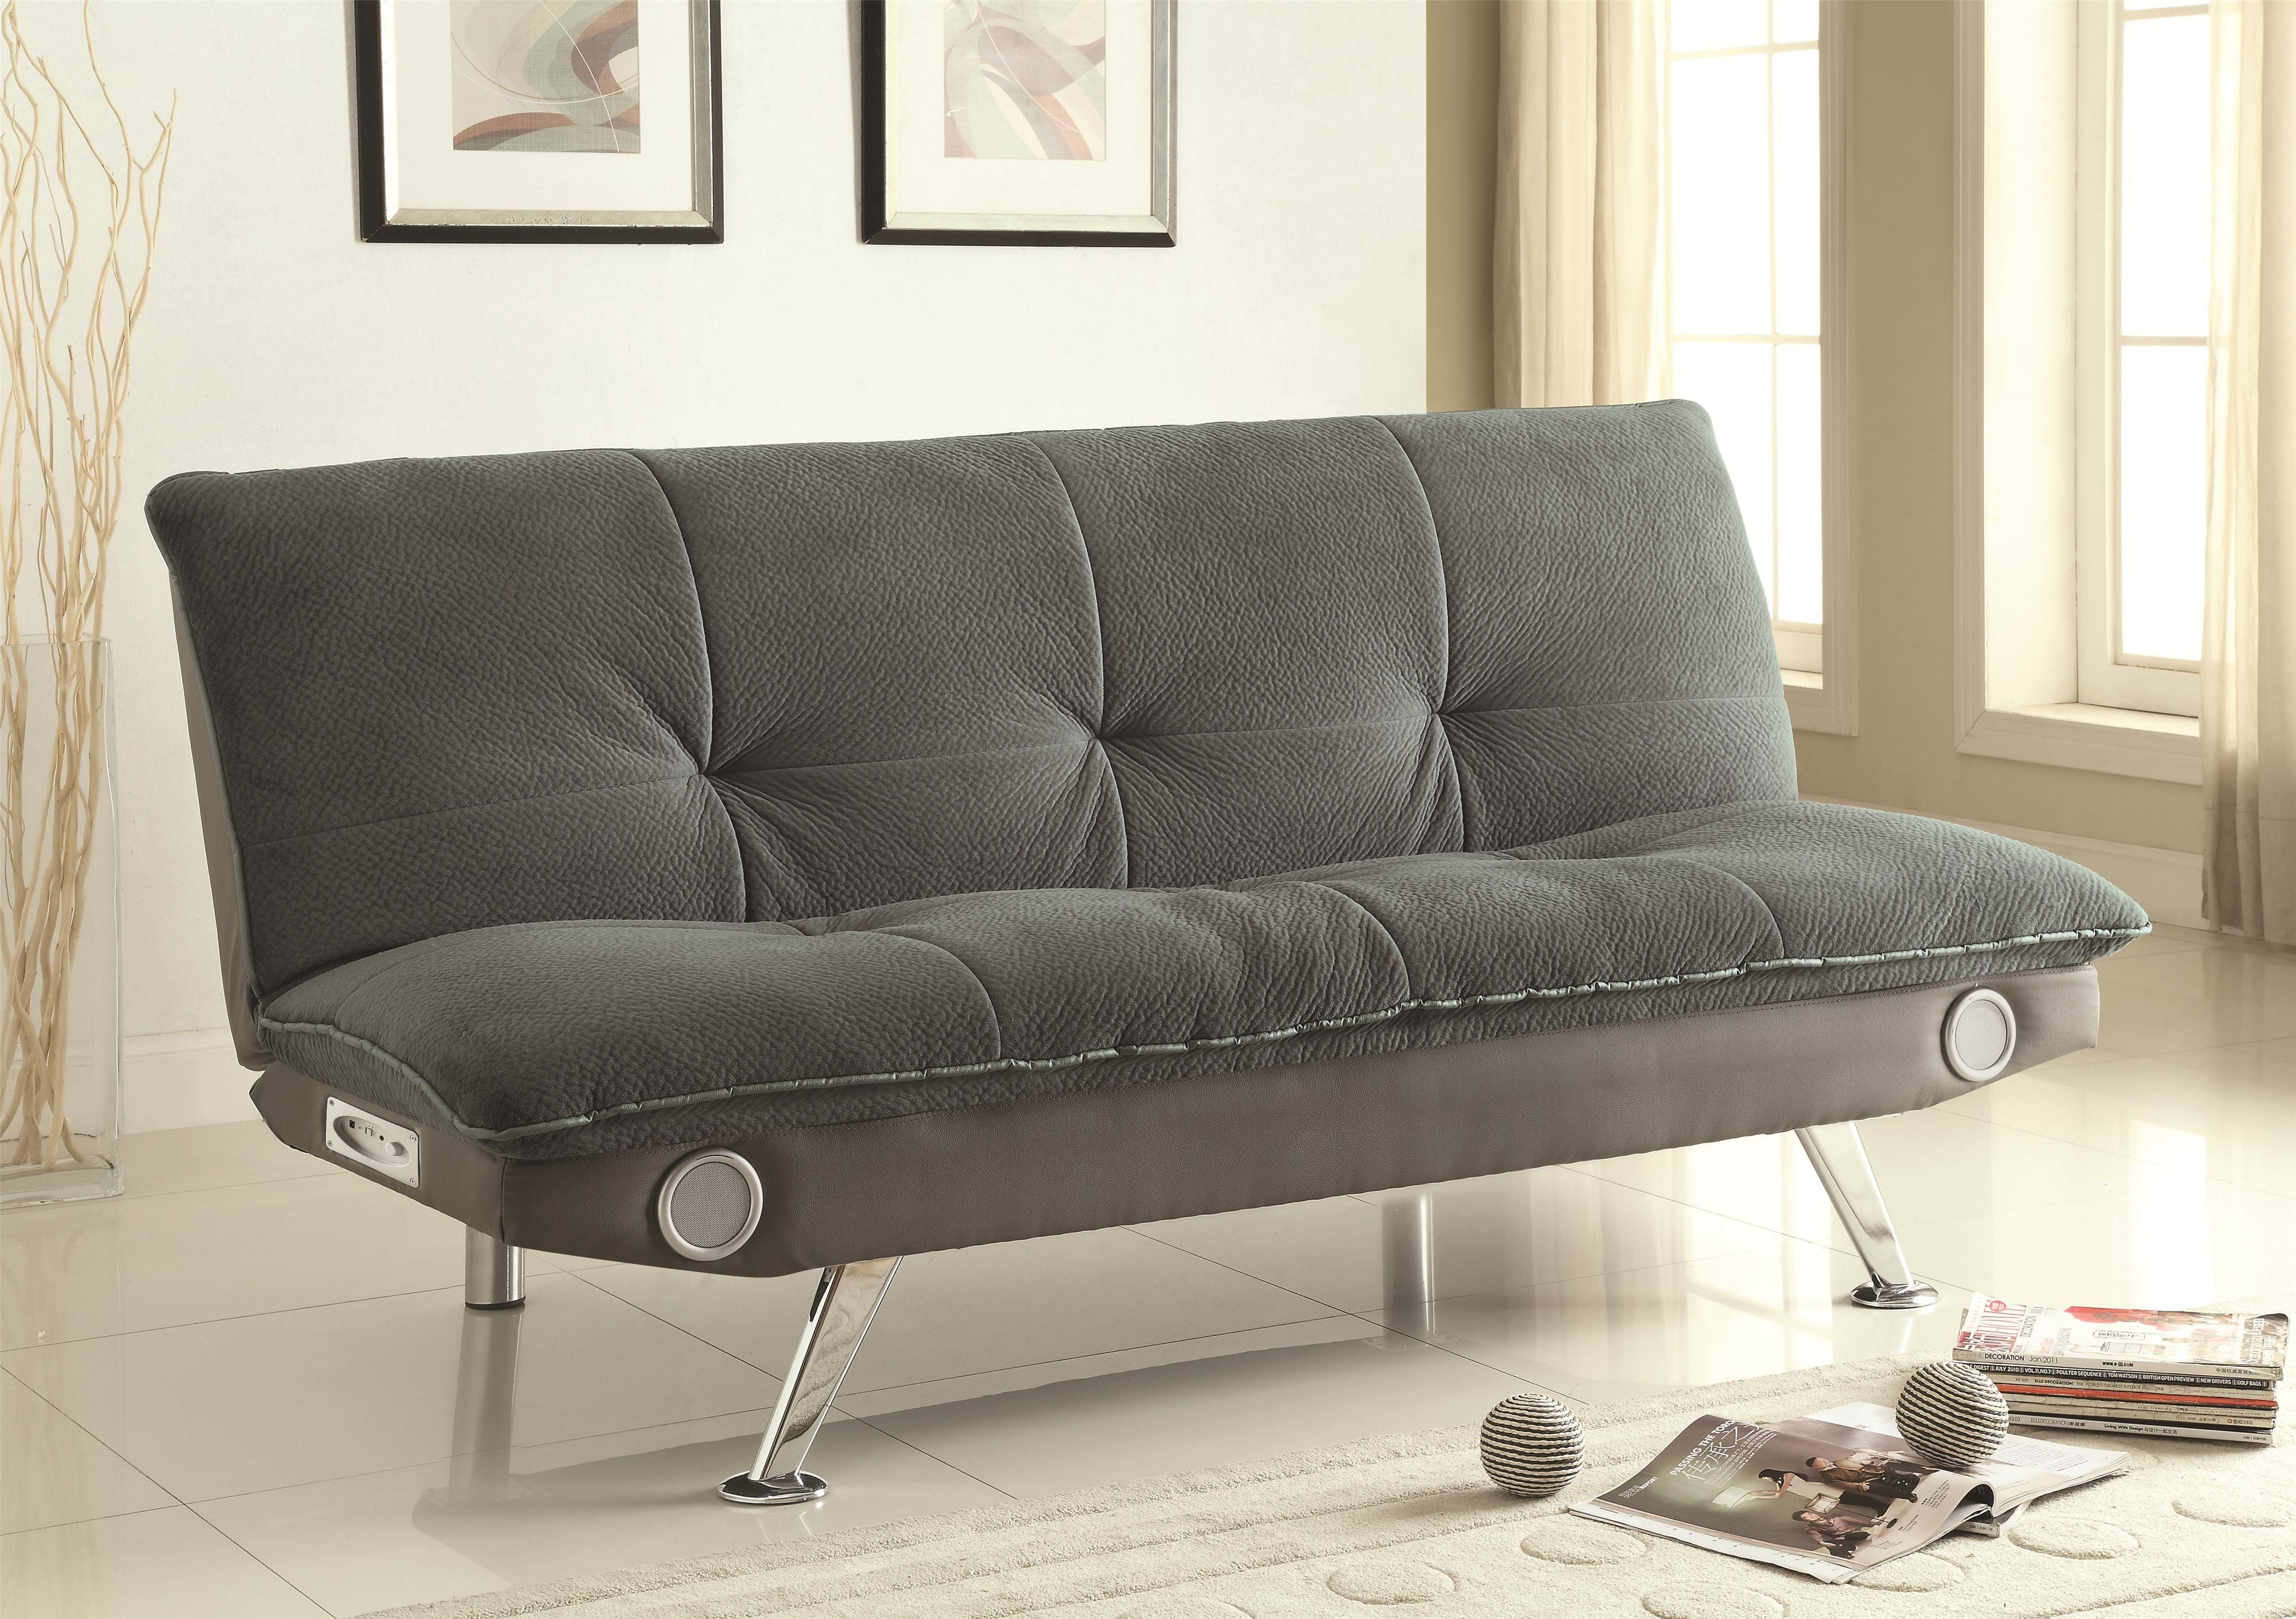 Futon Sofa Bed Blue